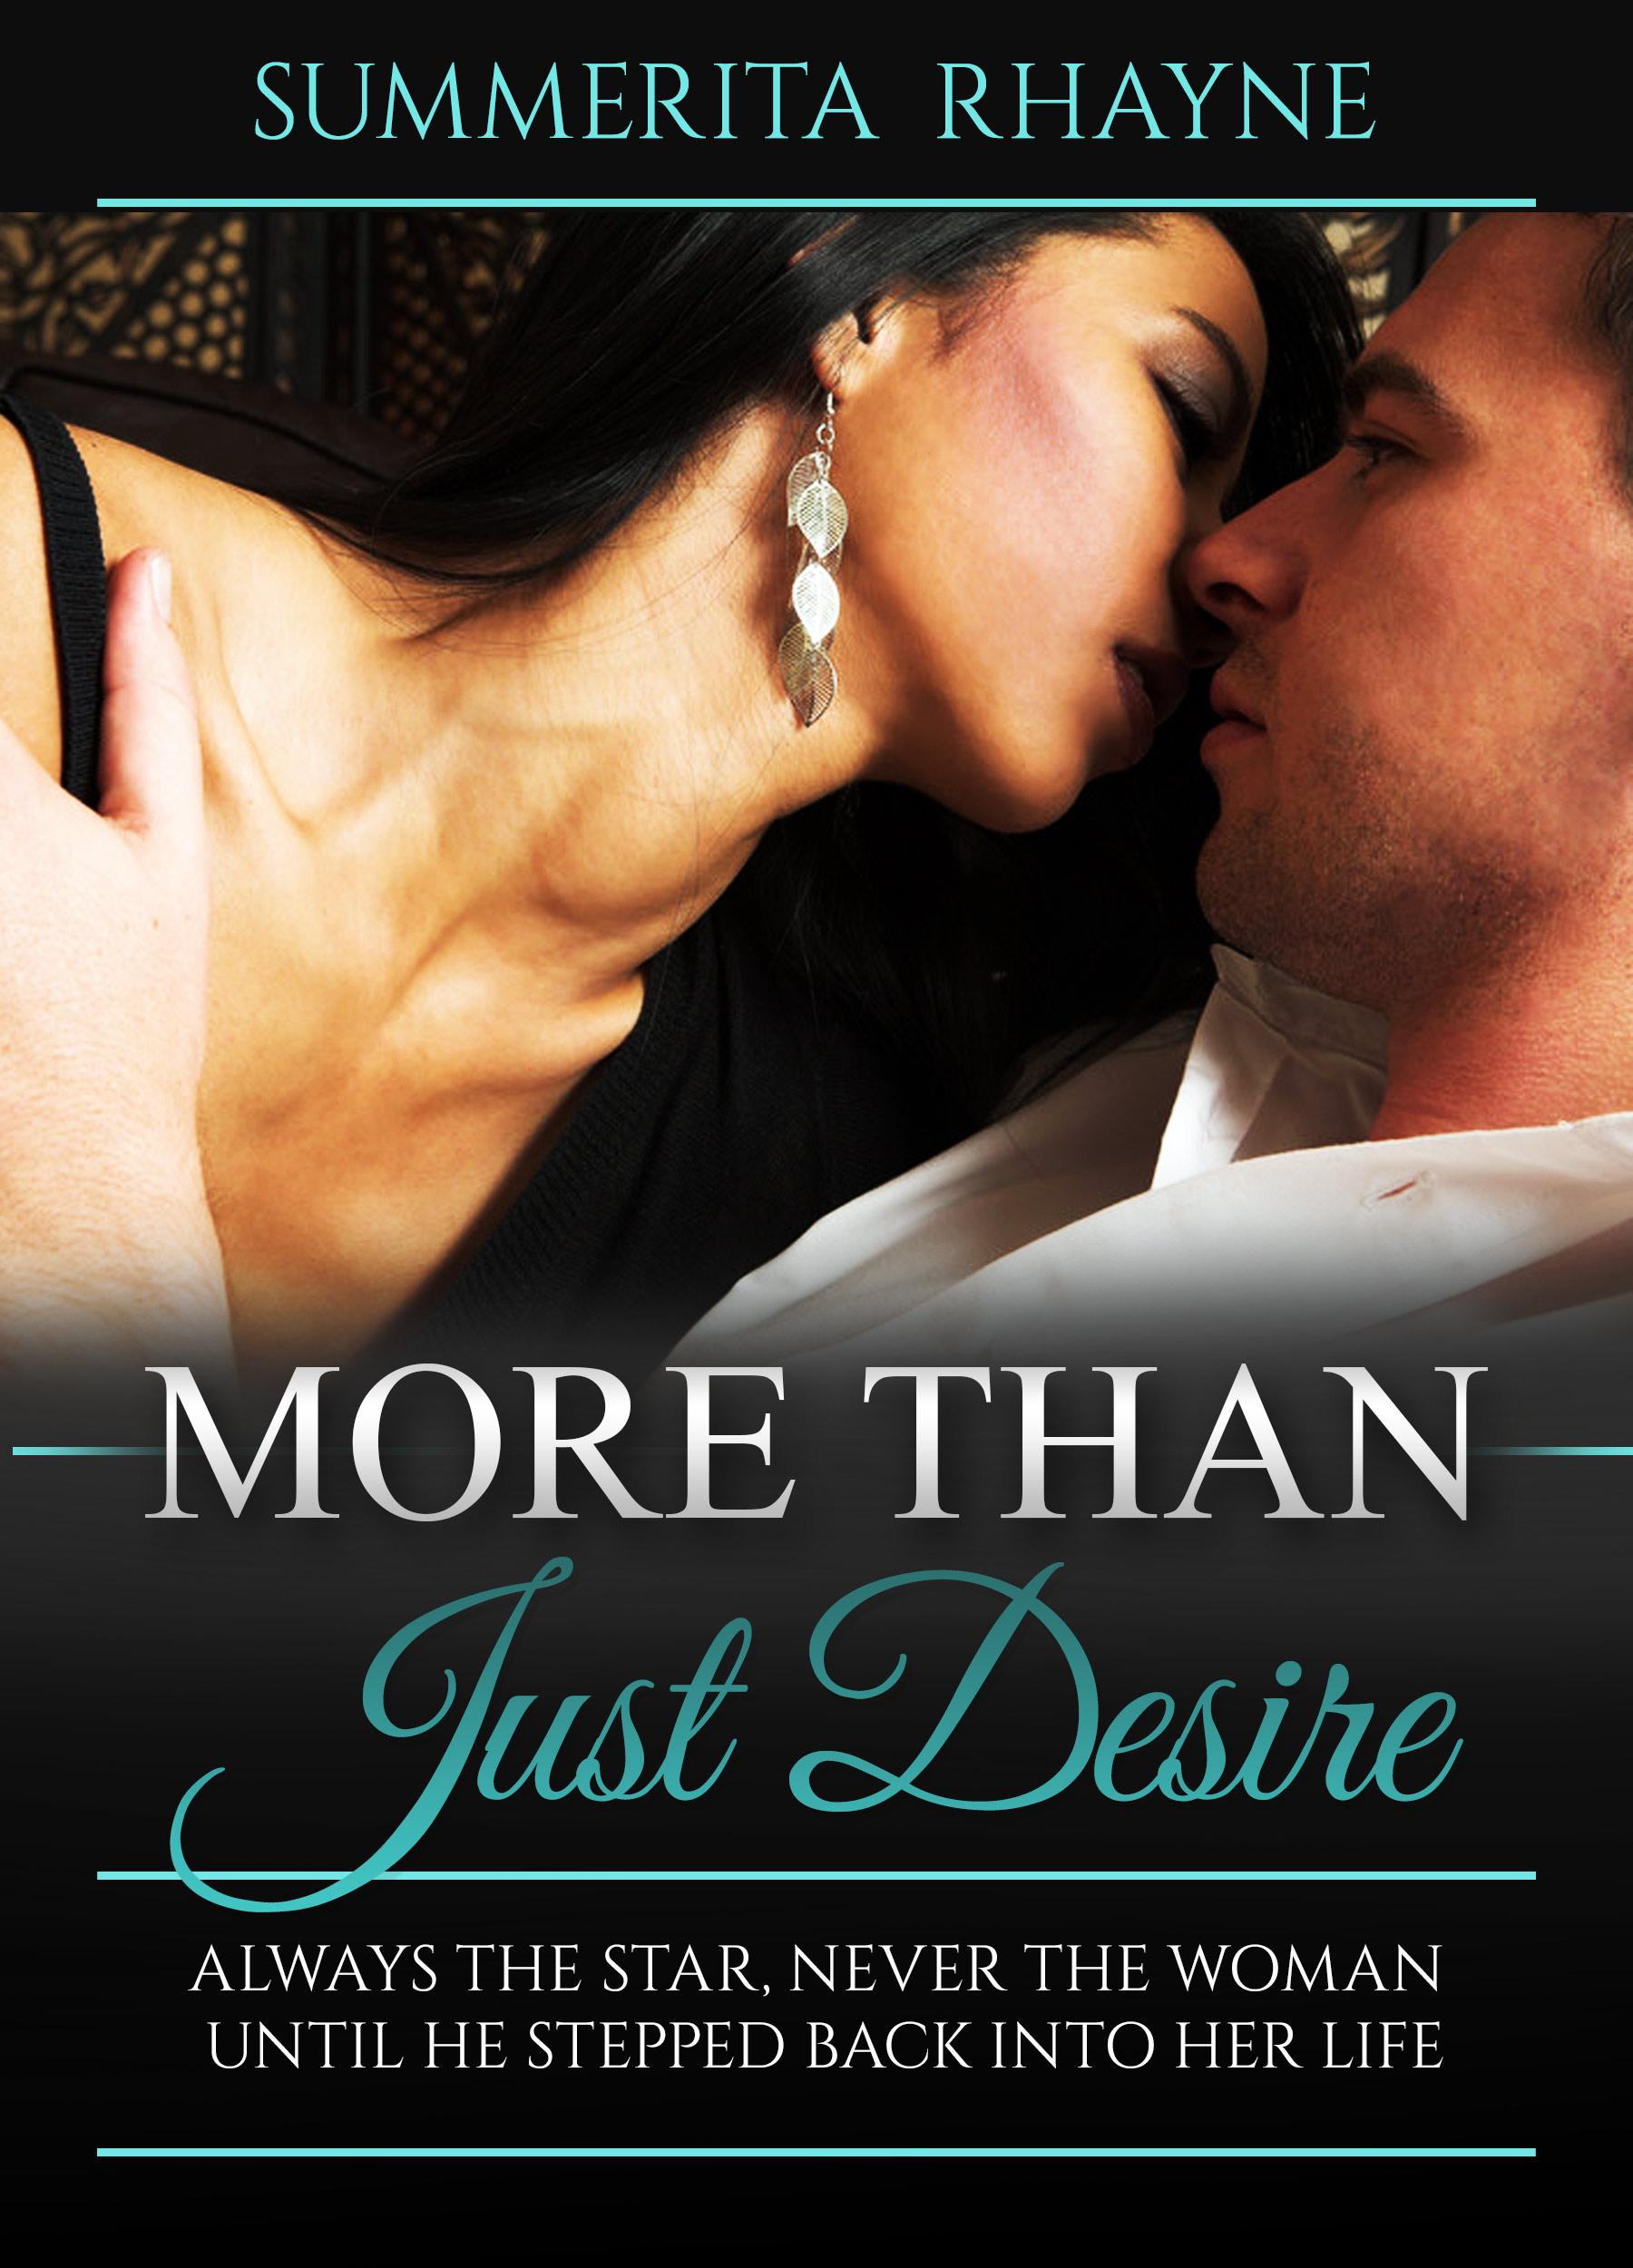 More Than Just Desire | Summerita Rhayne